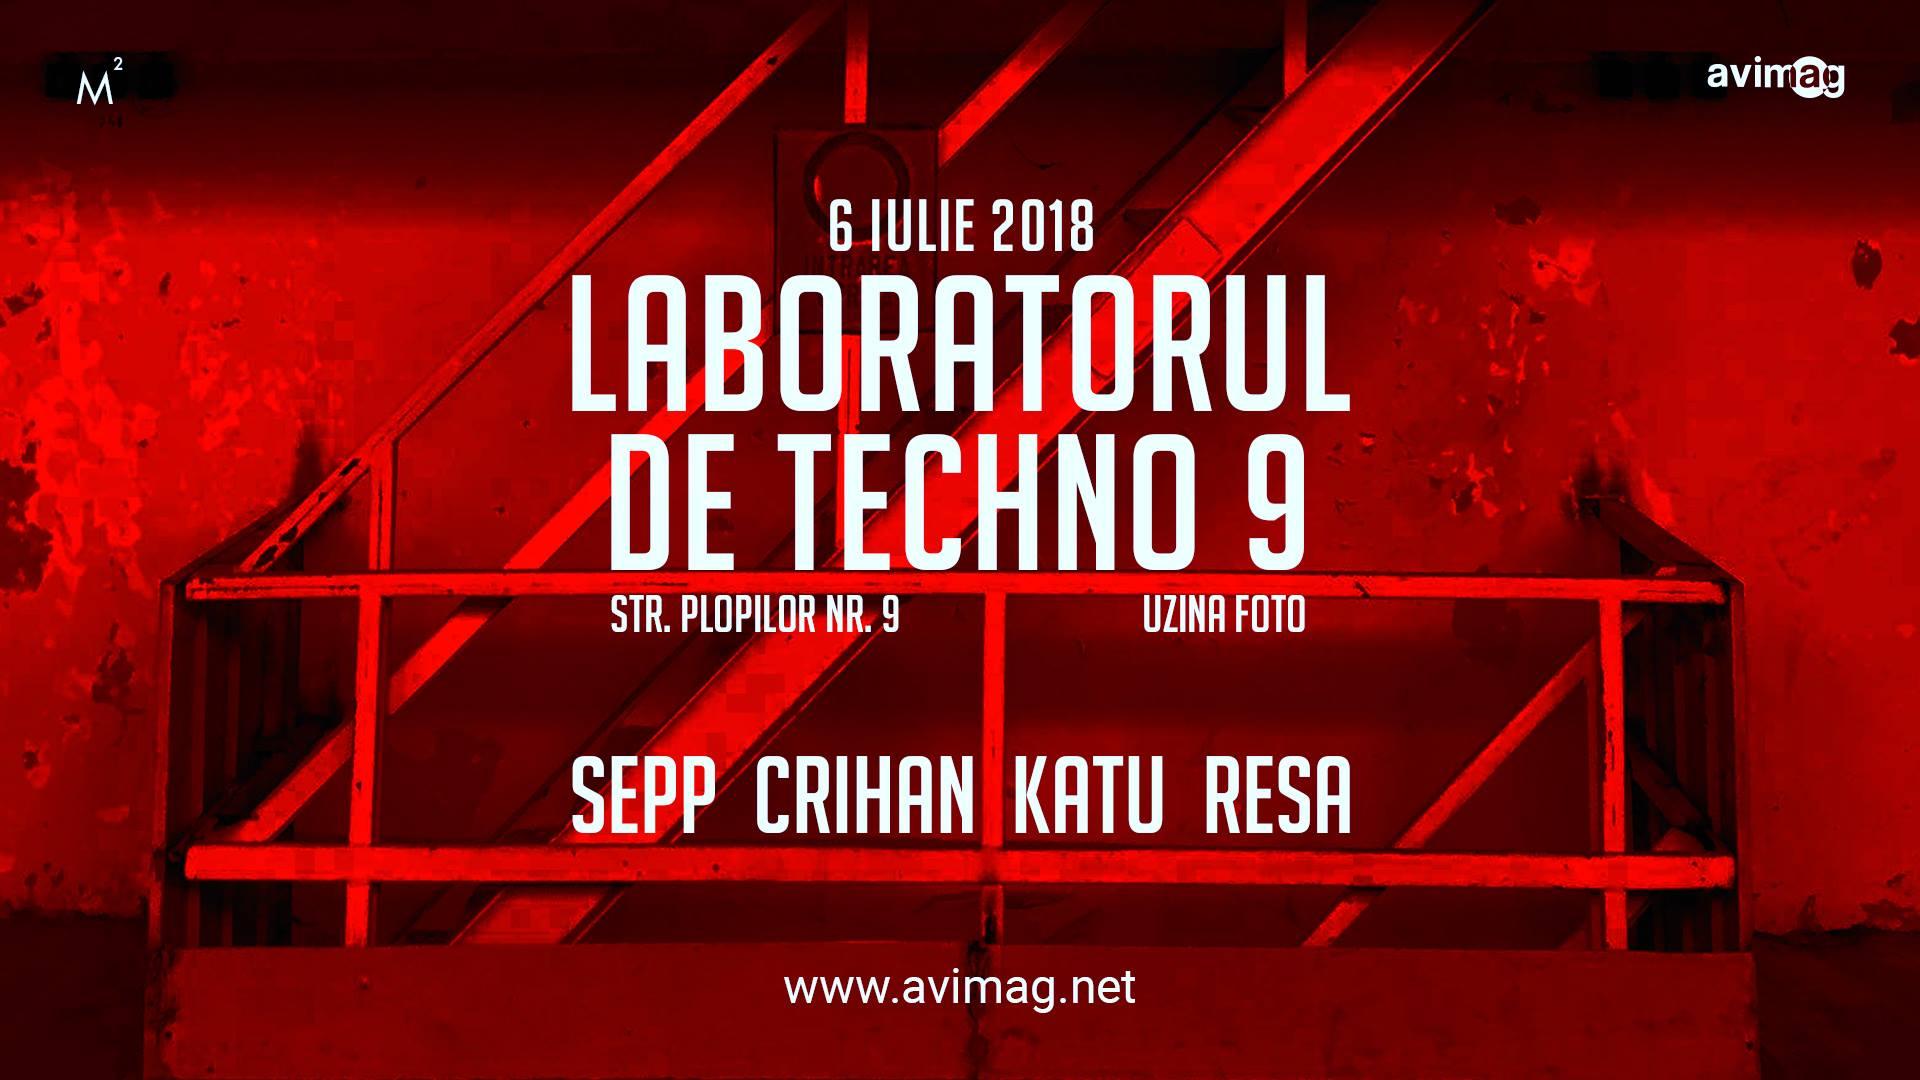 Laboratorul de Techno